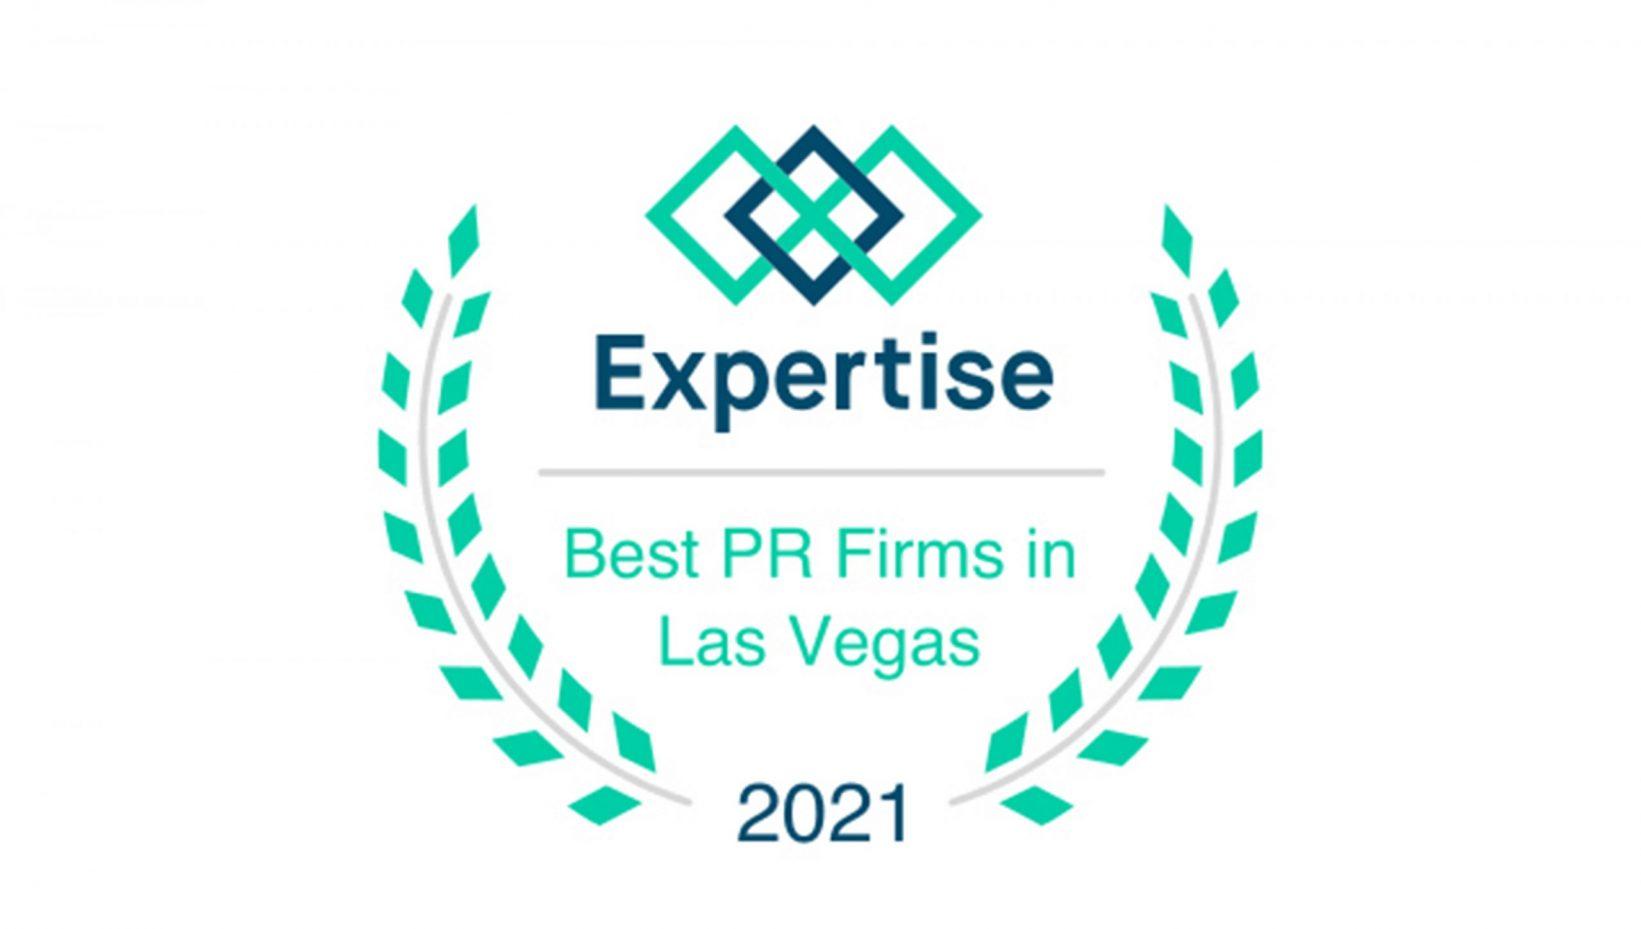 Best PR Firms in Las Vegas1